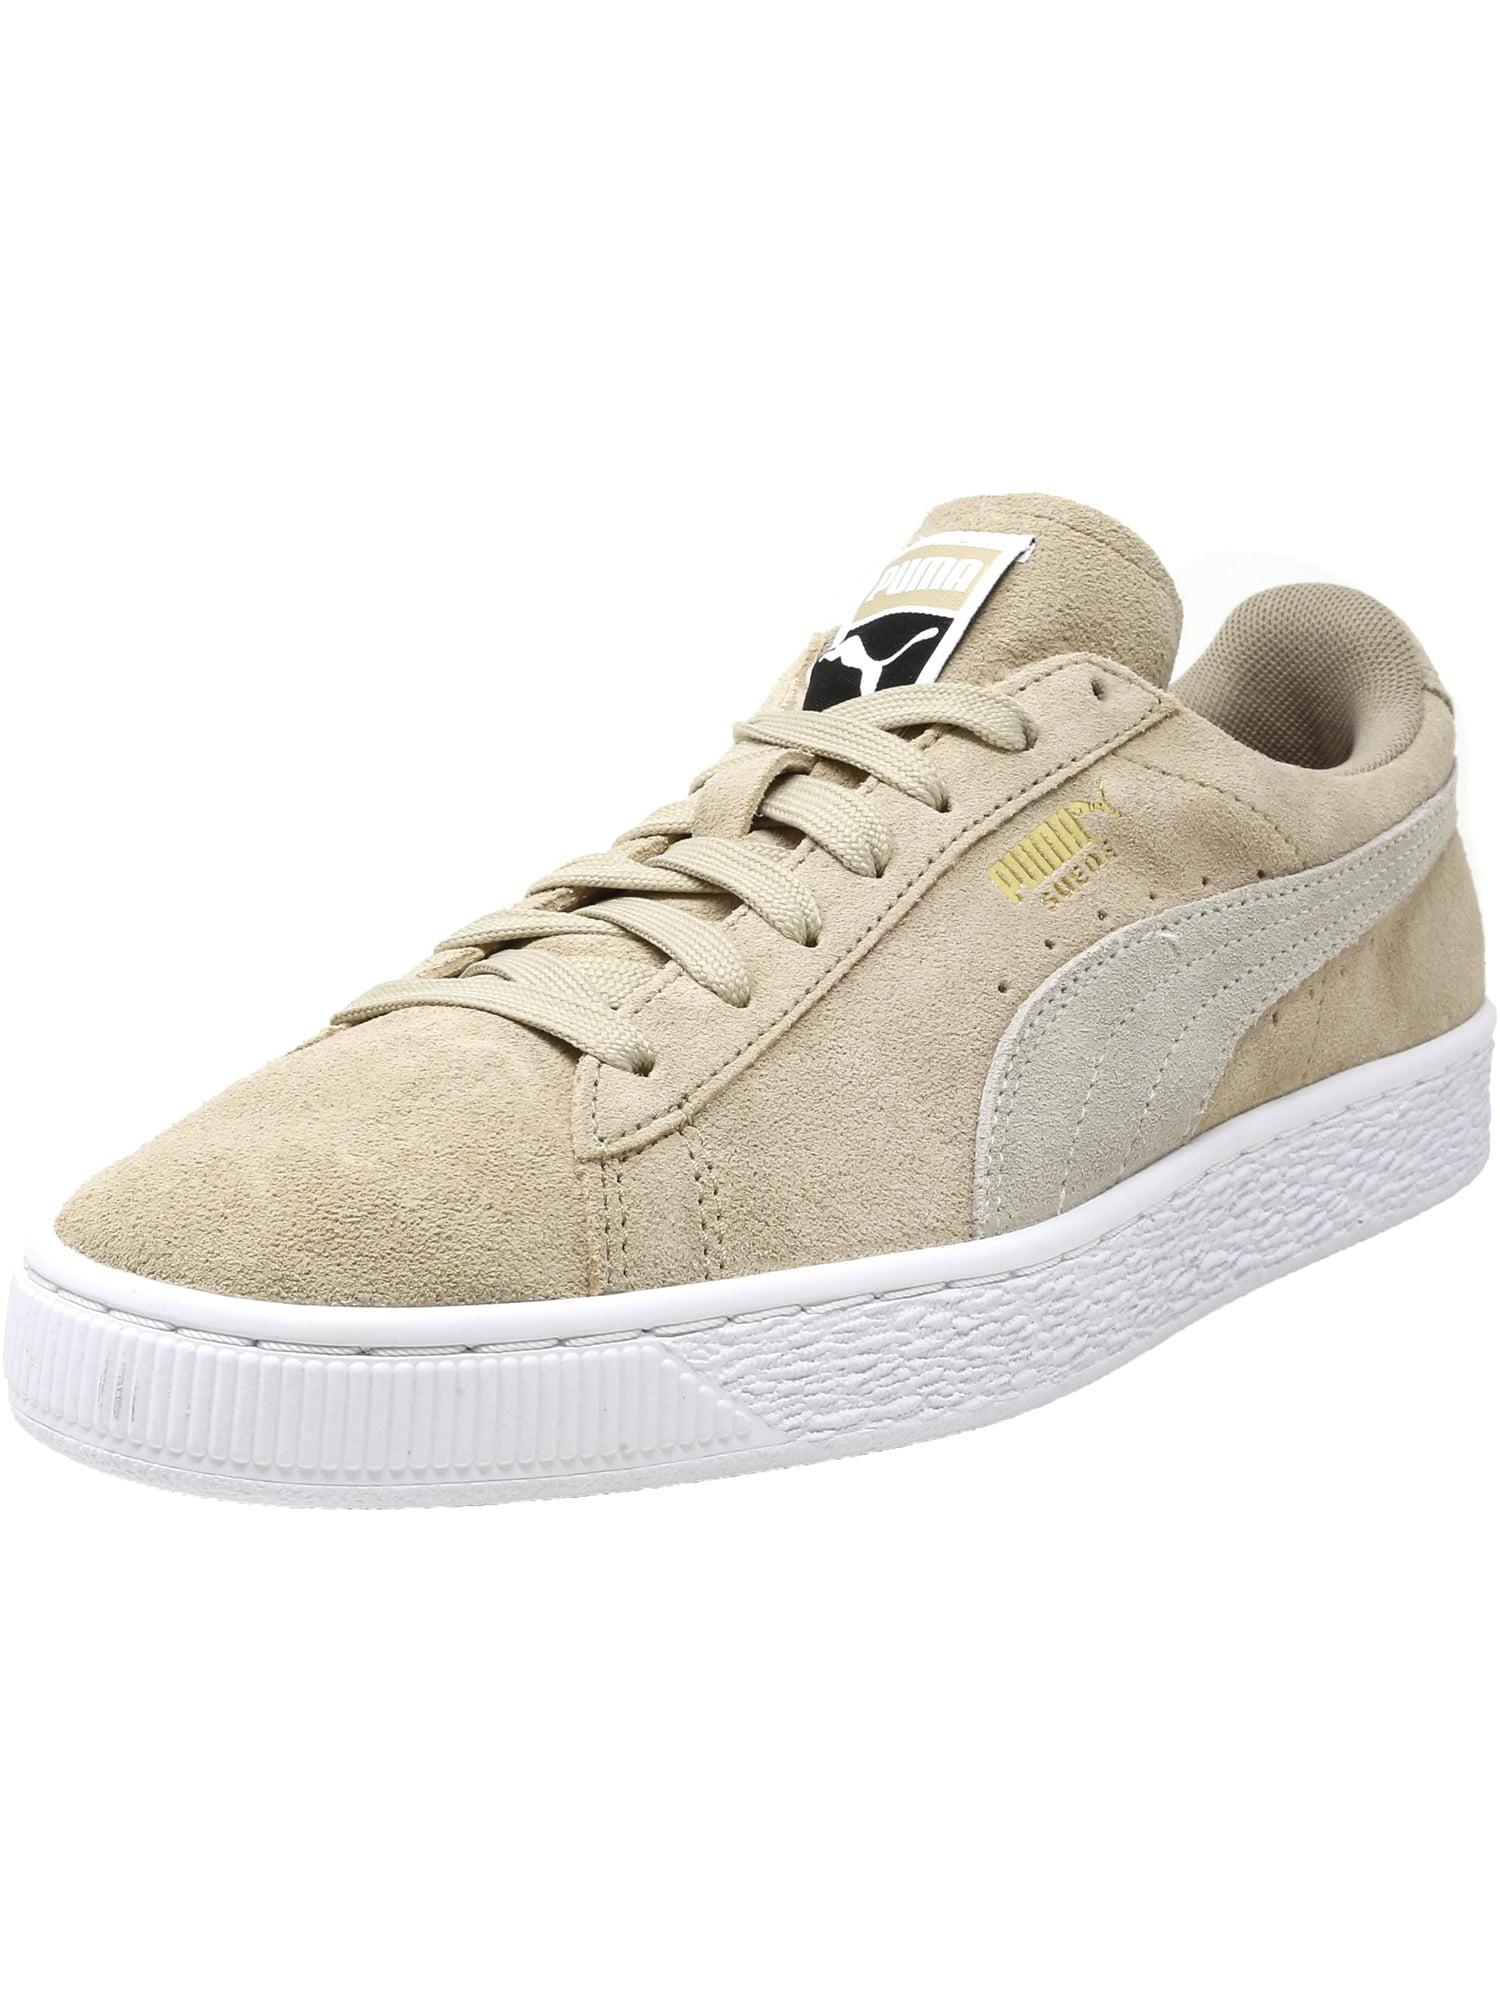 new arrival 58609 1f690 Puma Women's Classic Suede Safari / White Ankle-High Fashion Sneaker - 10M